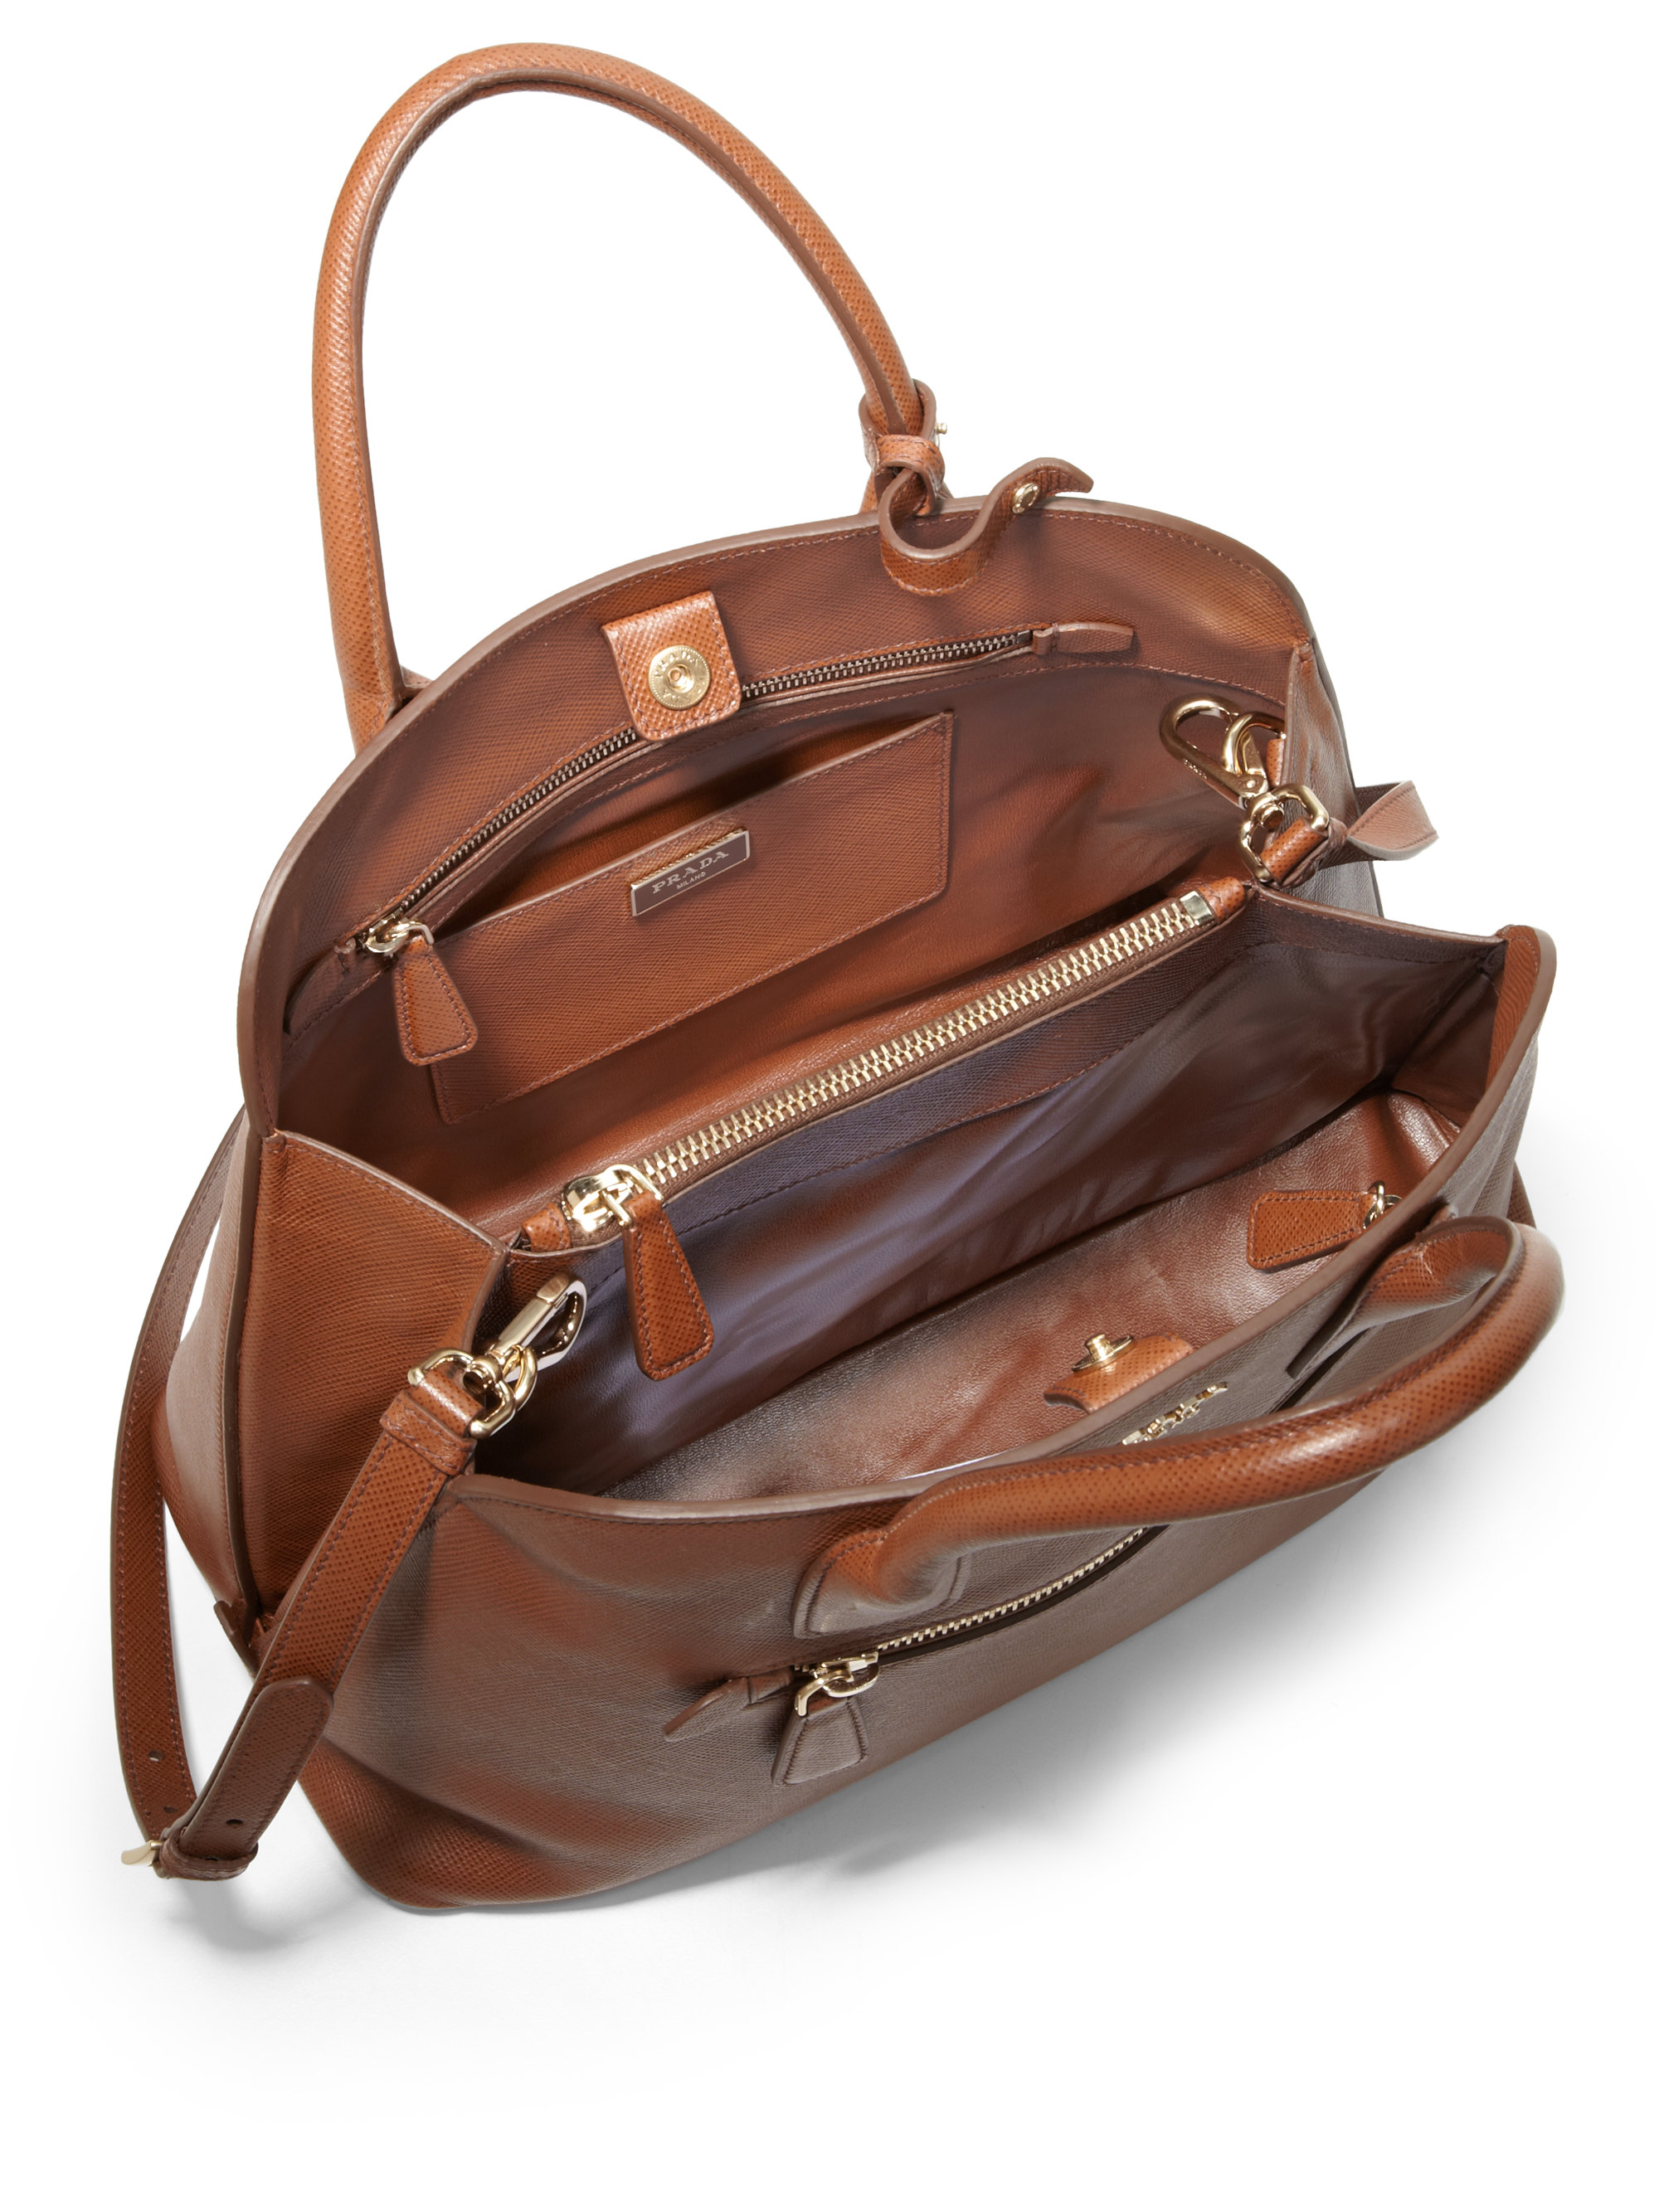 purple prada purse - prada tessuto saffiano satchel, prada chain purse